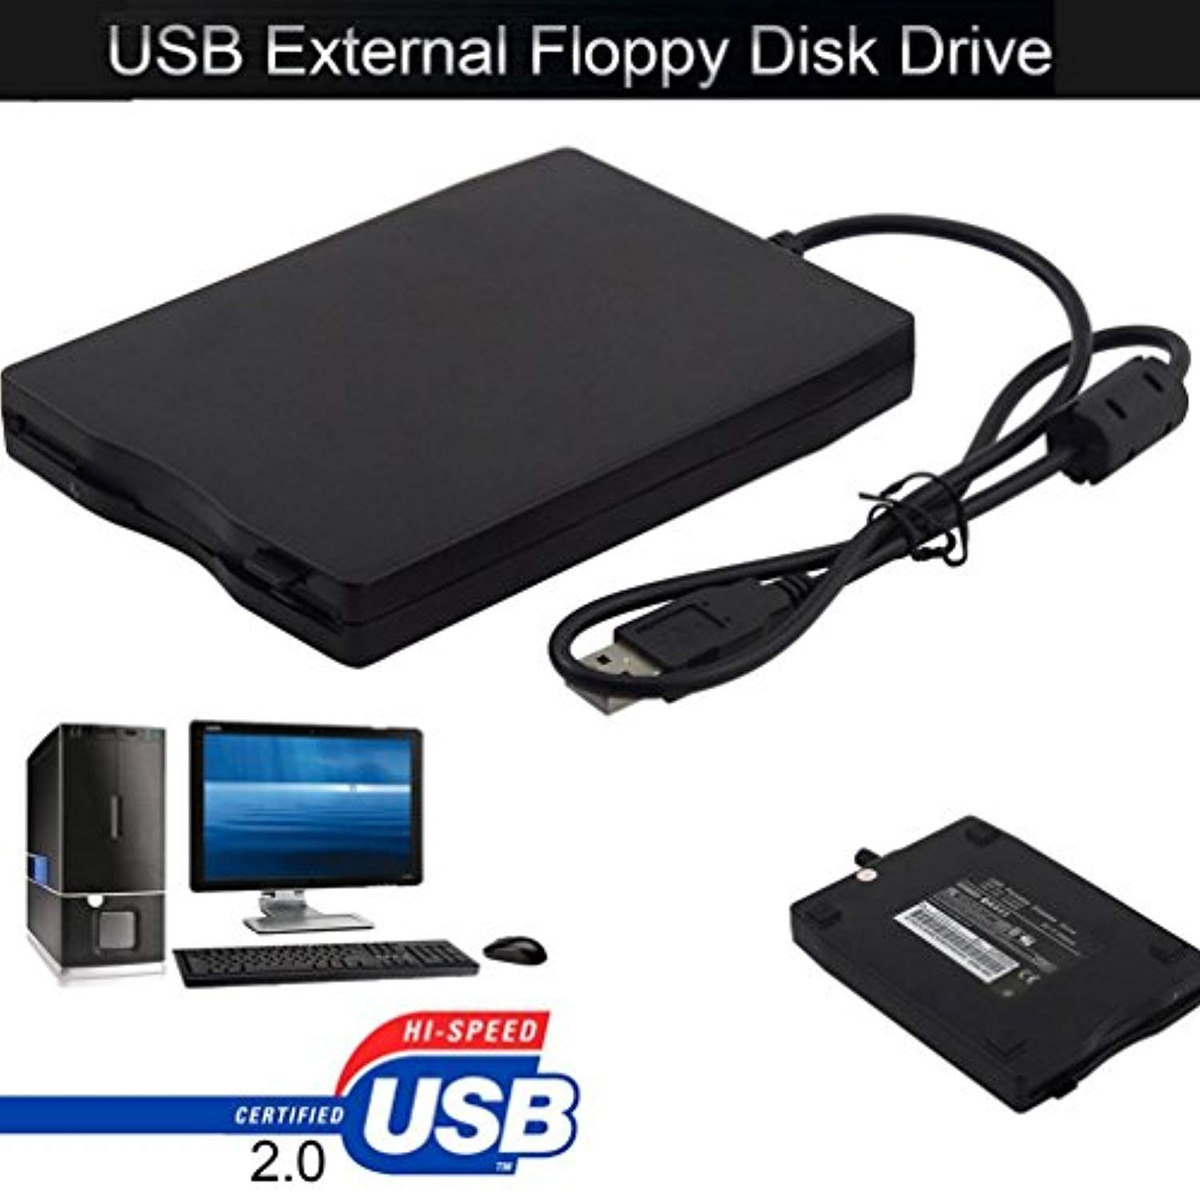 Q-STOR USB EXTERNAL FLOPPY DISK WINDOWS 8.1 DRIVER DOWNLOAD